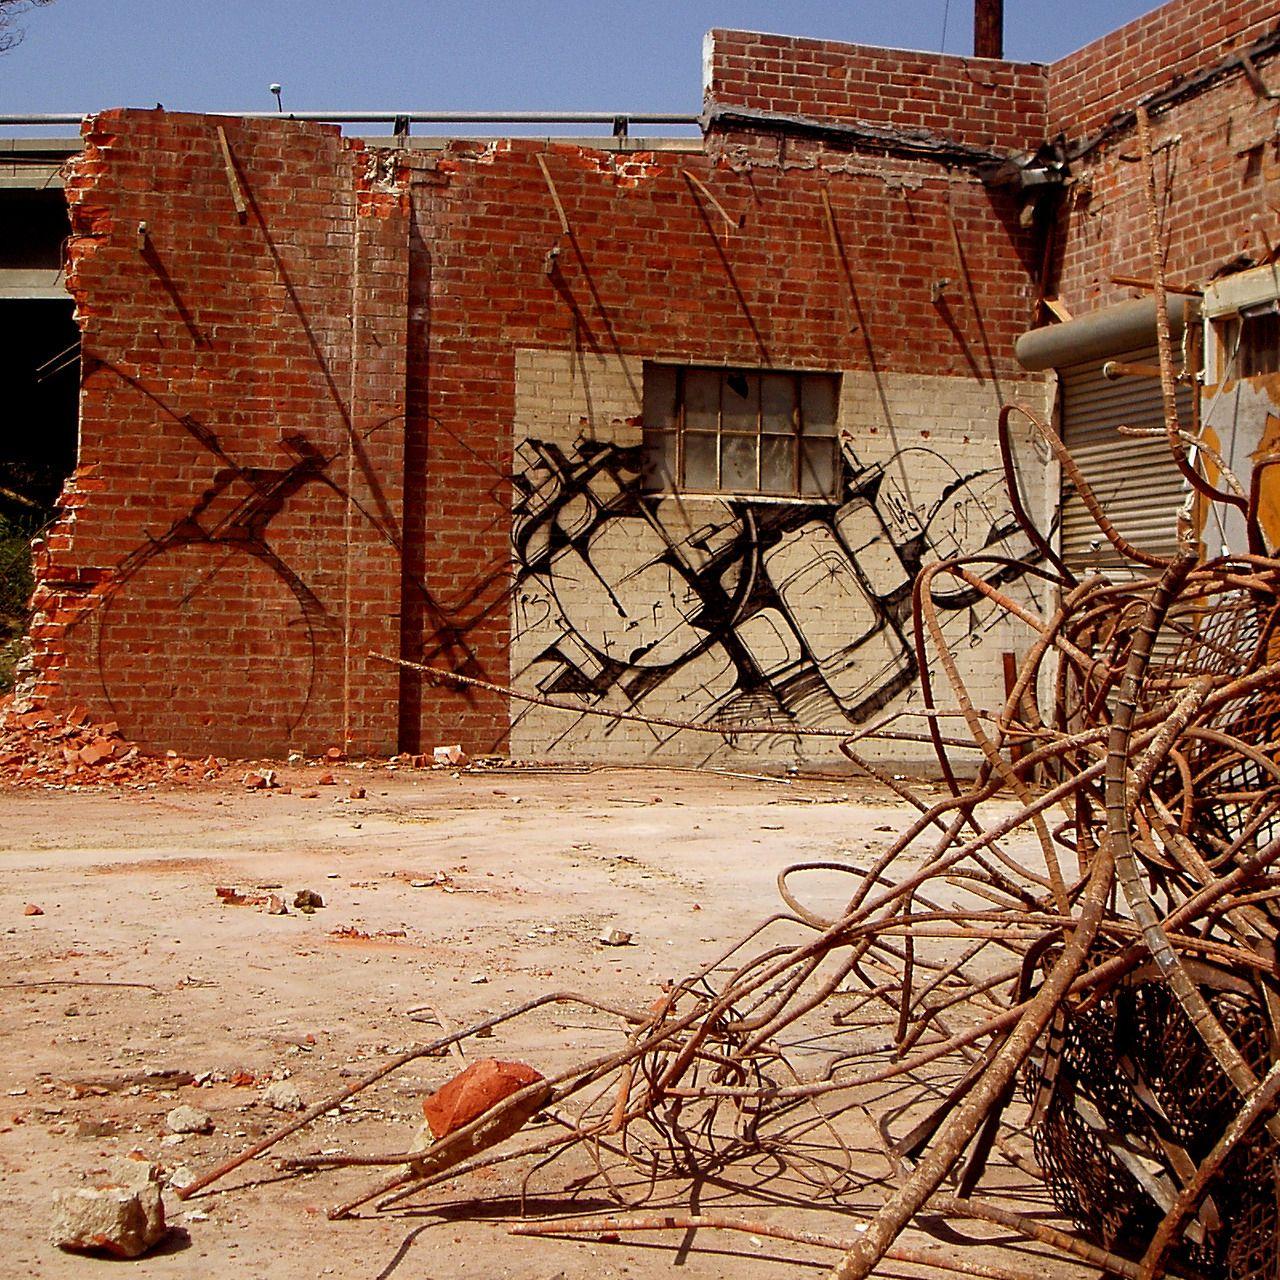 Urban Exploration, Abandoned, Forgotten, Rust, Decaying